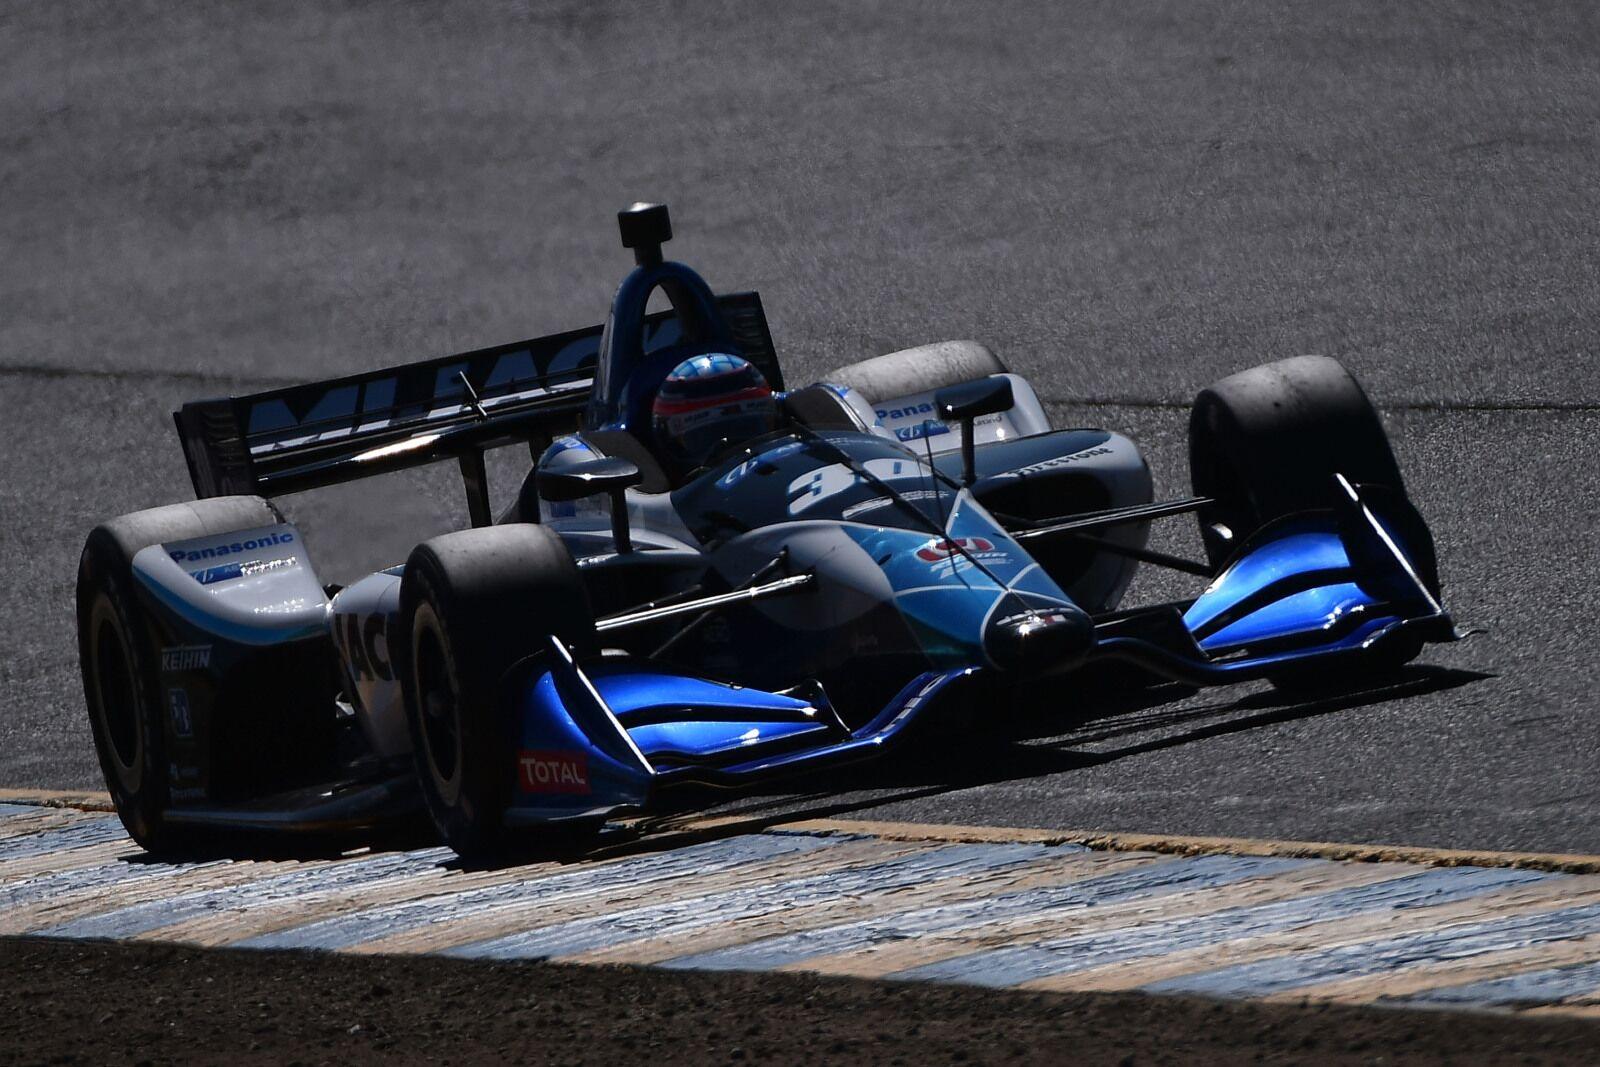 IndyCar: Takuma Sato to return to Rahal Letterman Lanigan Racing in 2019